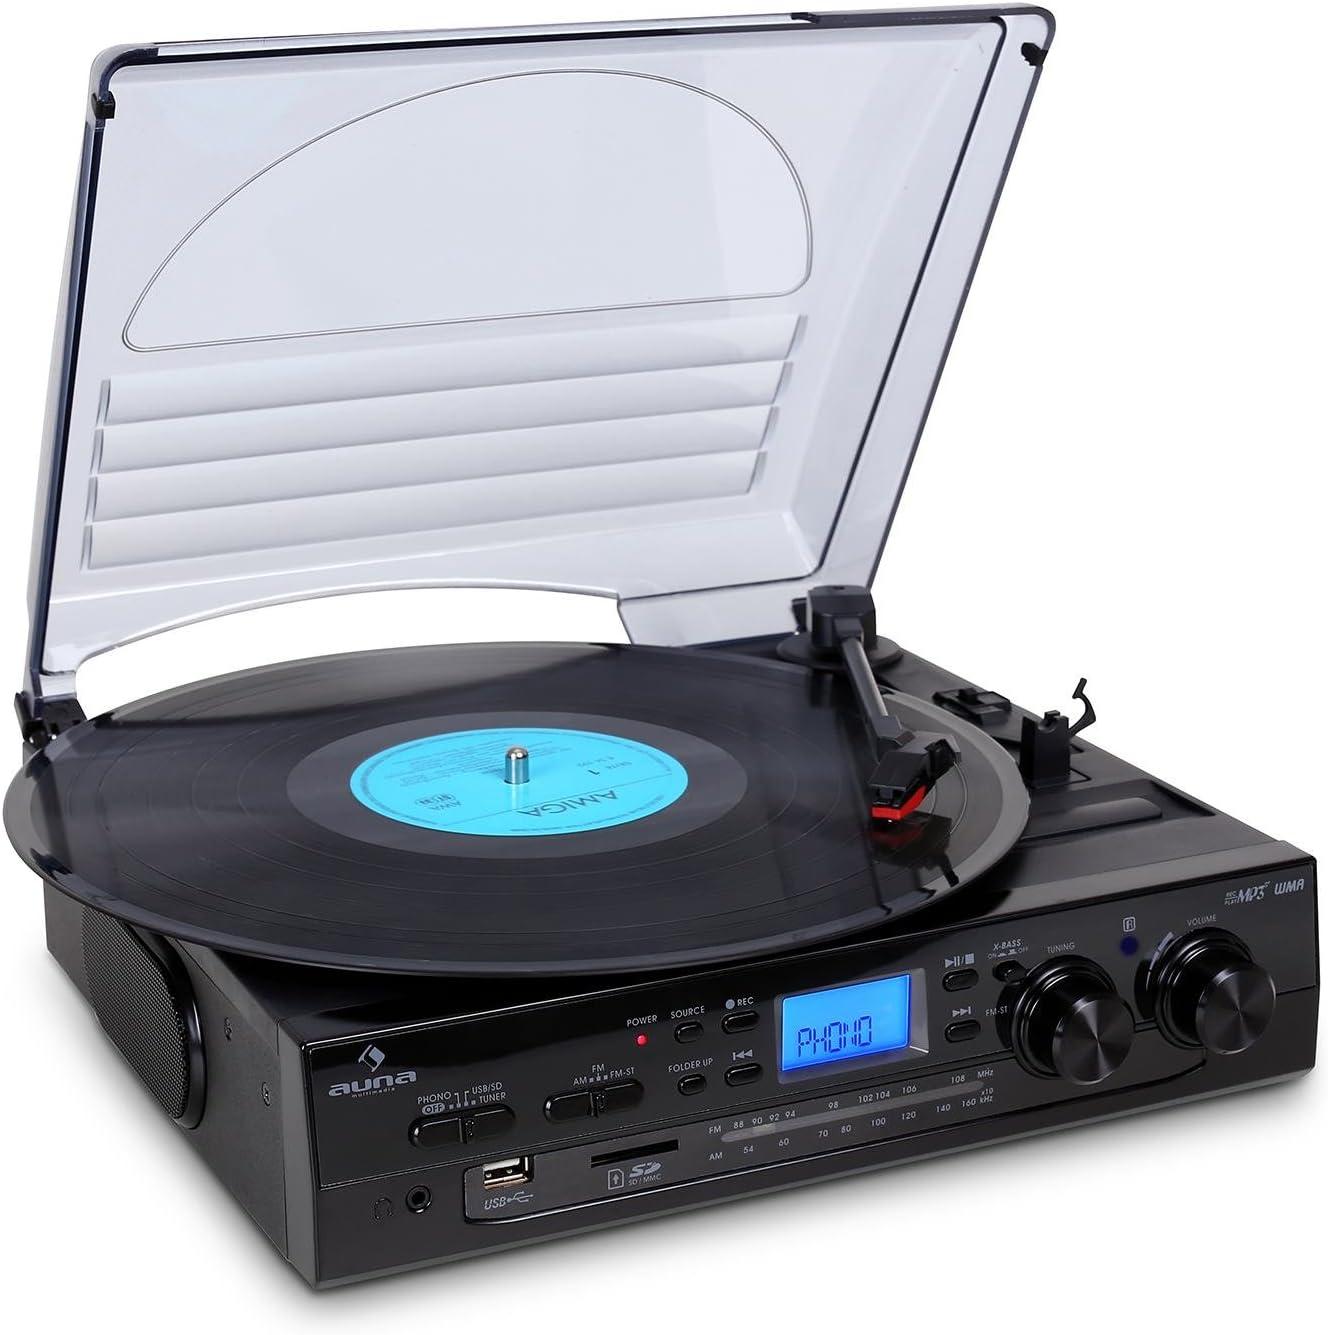 AUNA TT-186E Equipo estéreo Tocadiscos: Amazon.es: Electrónica